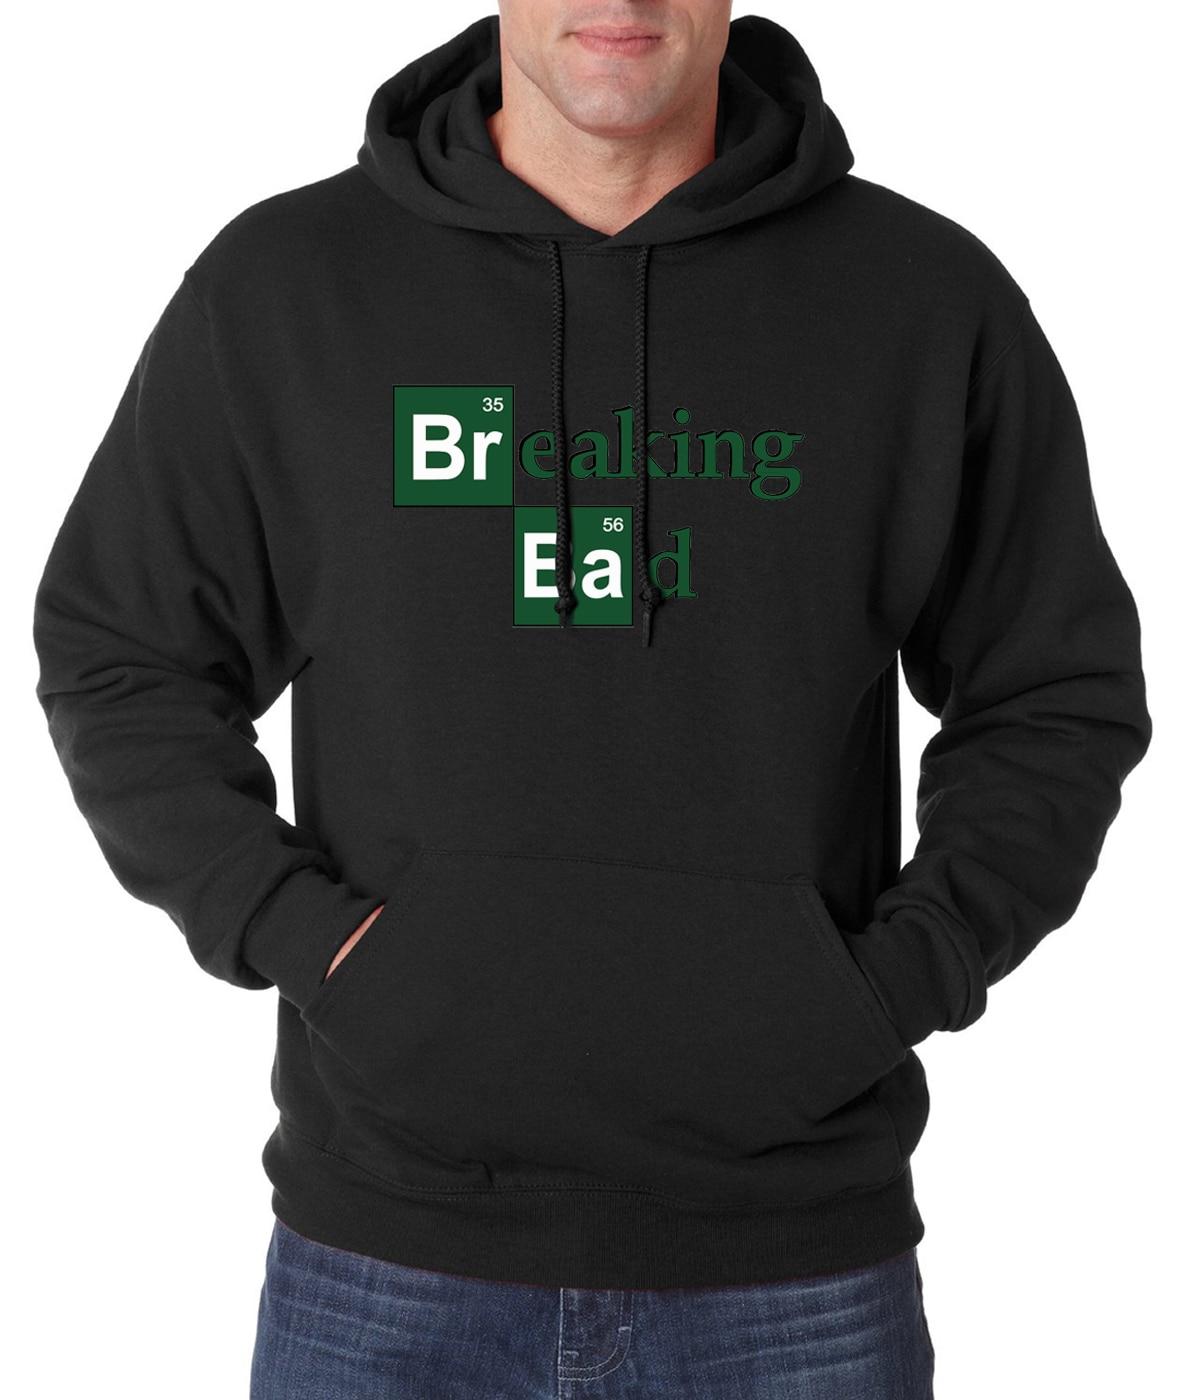 Hot Sale Breaking Bad Men Sweatshirts Hooded 2019 Autumn Winter New Fashion Hoodie Men Fleece Loose Fit Sudadera Hombre S-2XL